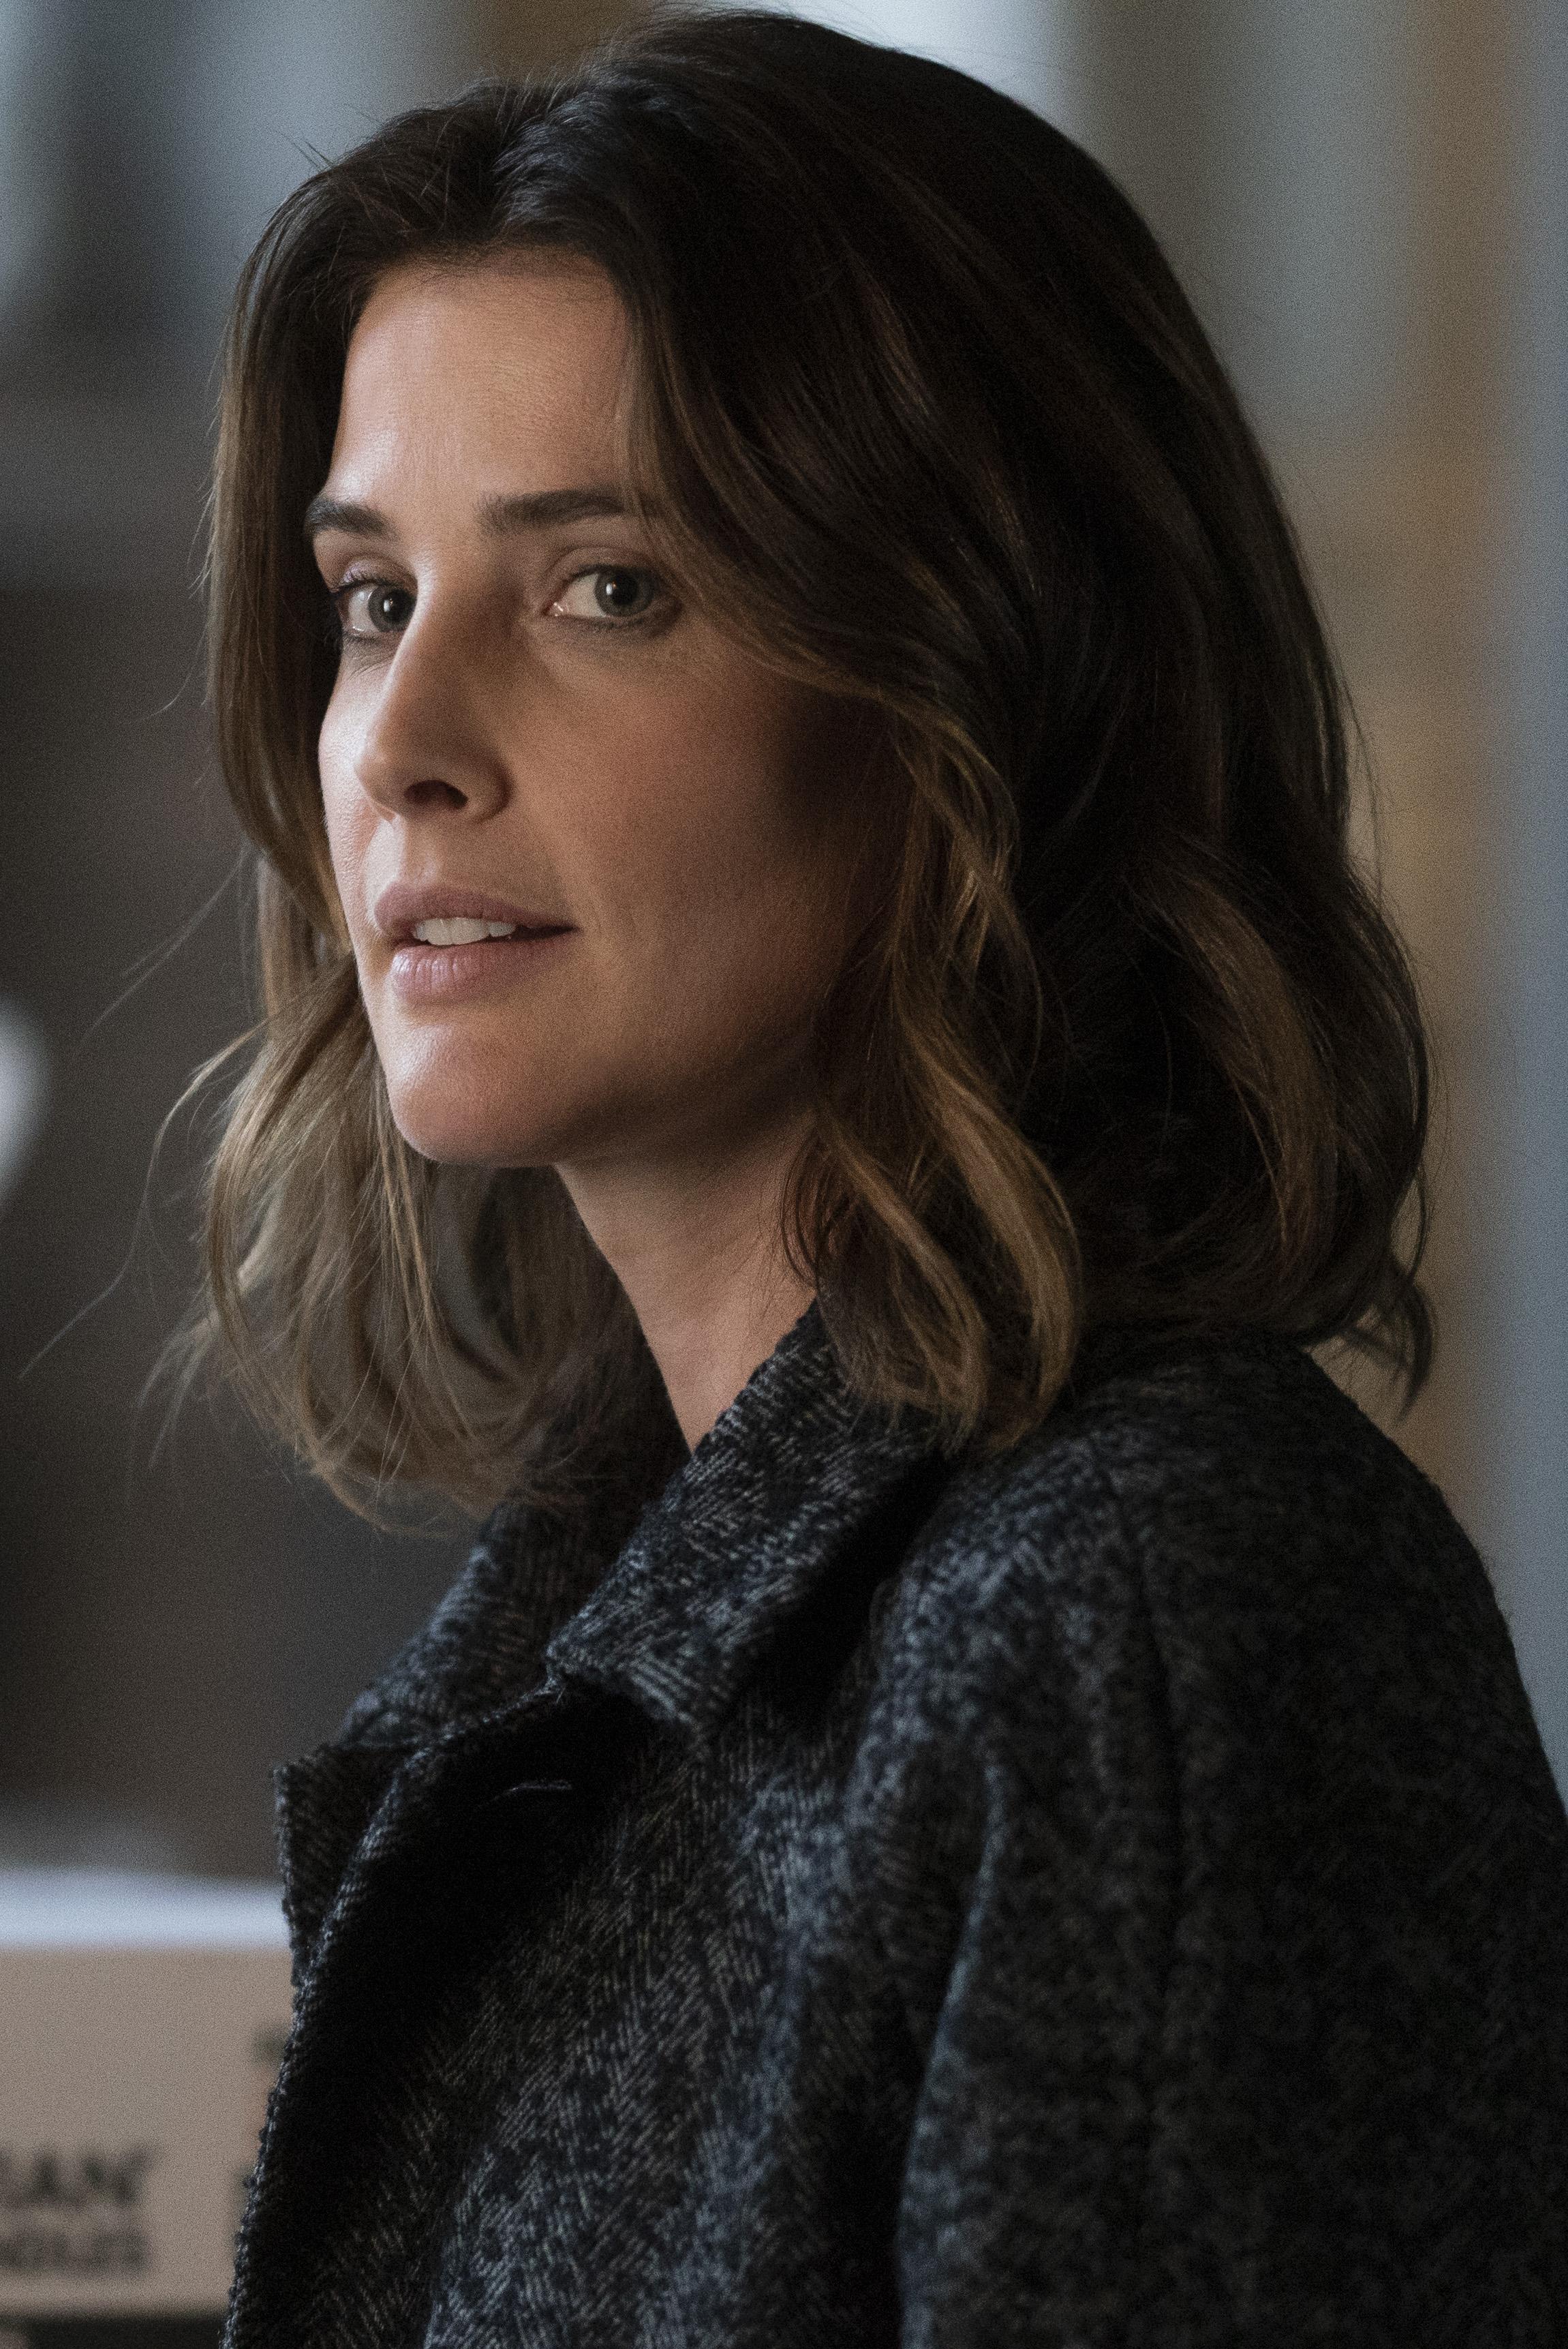 Cobie Smulders Stars in Stumptown New ABC TV Show